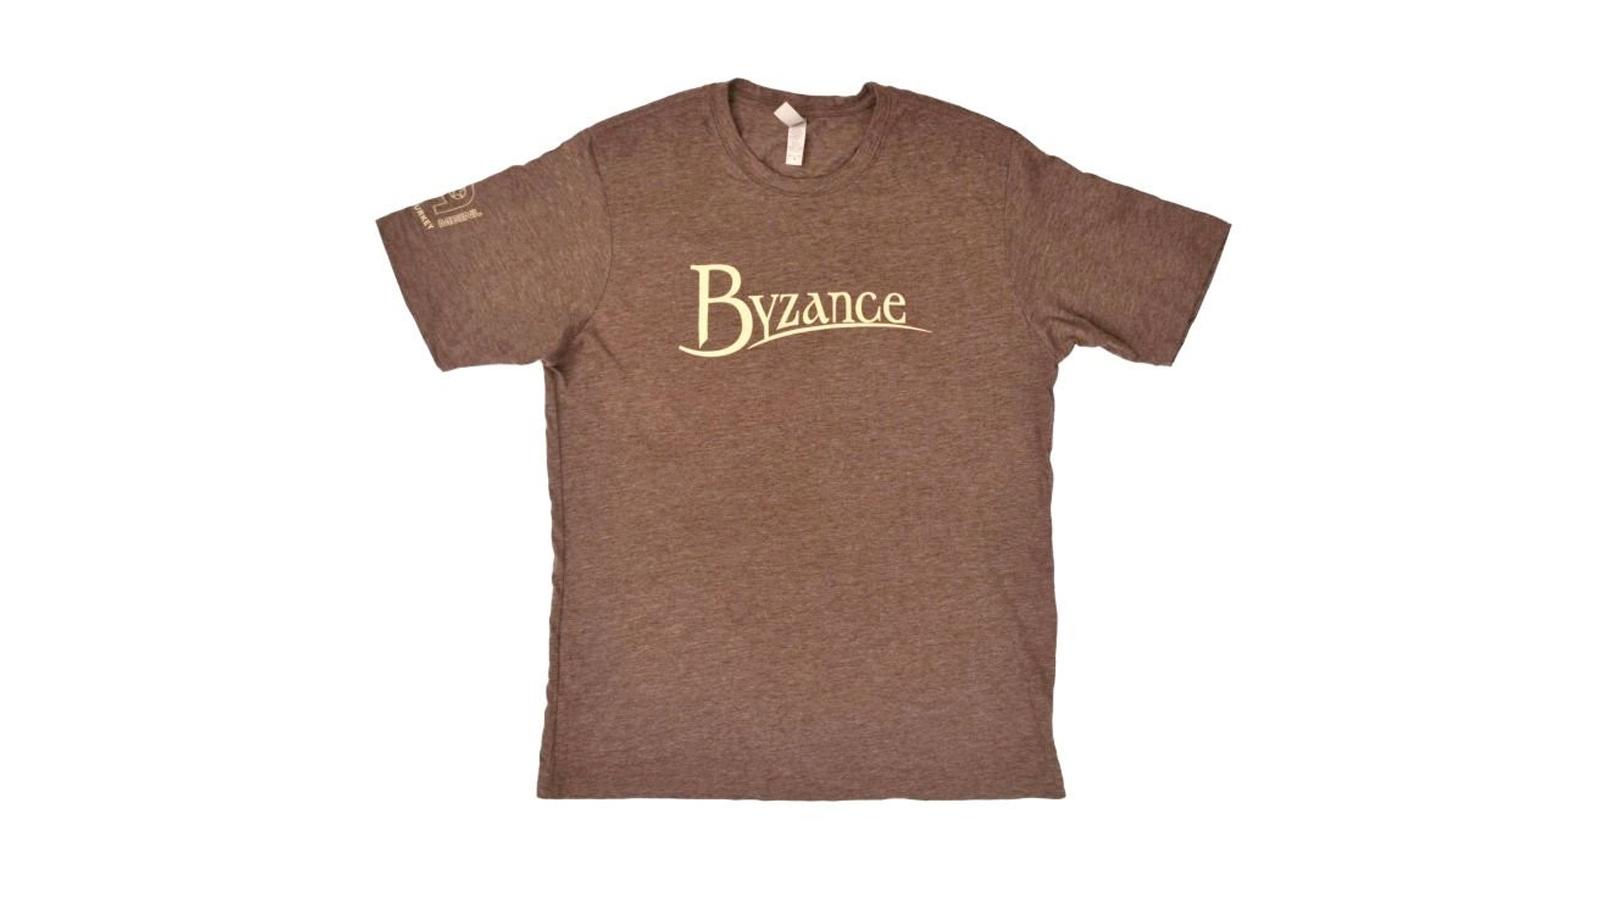 Meinl S75-M T-Shirt Byzance Logo